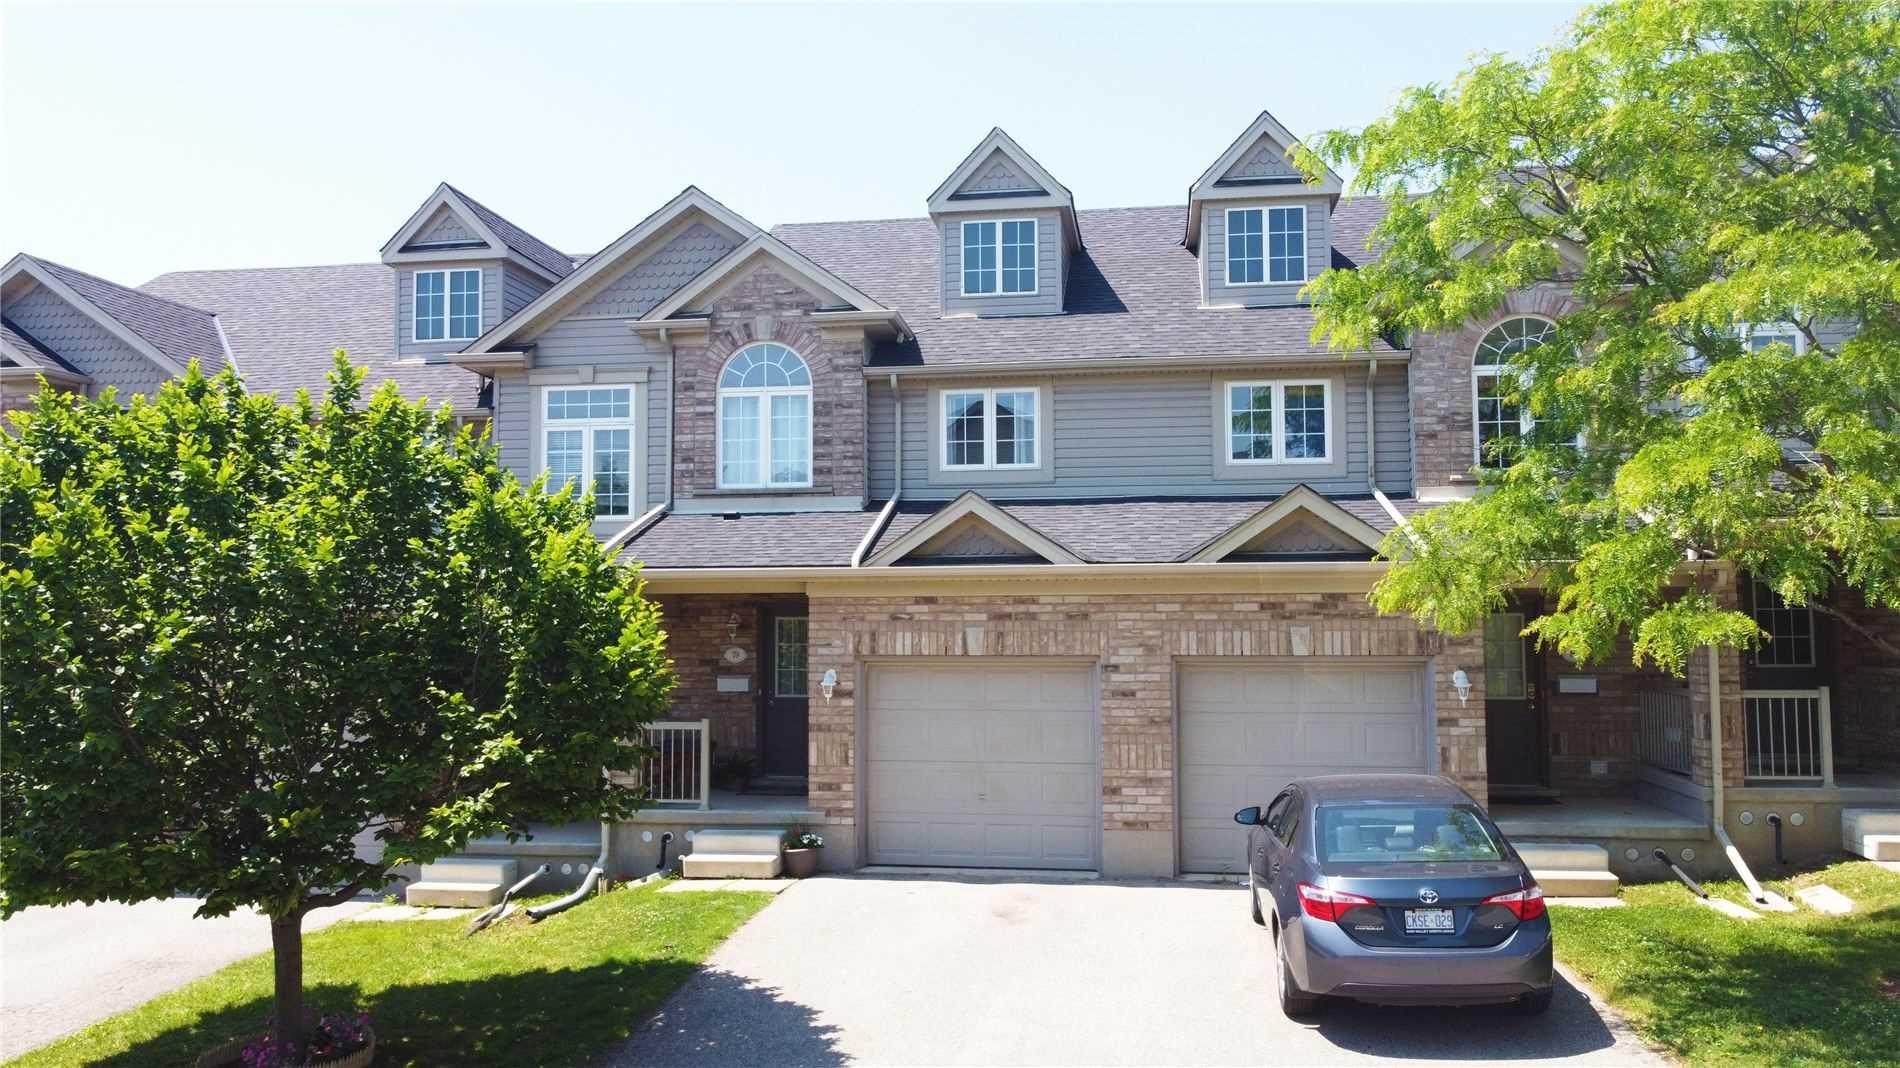 1155 Gordon St, Guelph, Ontario N1L 1S8, 3 Bedrooms Bedrooms, ,3 BathroomsBathrooms,Condo Townhouse,For Sale,Gordon,X5272489